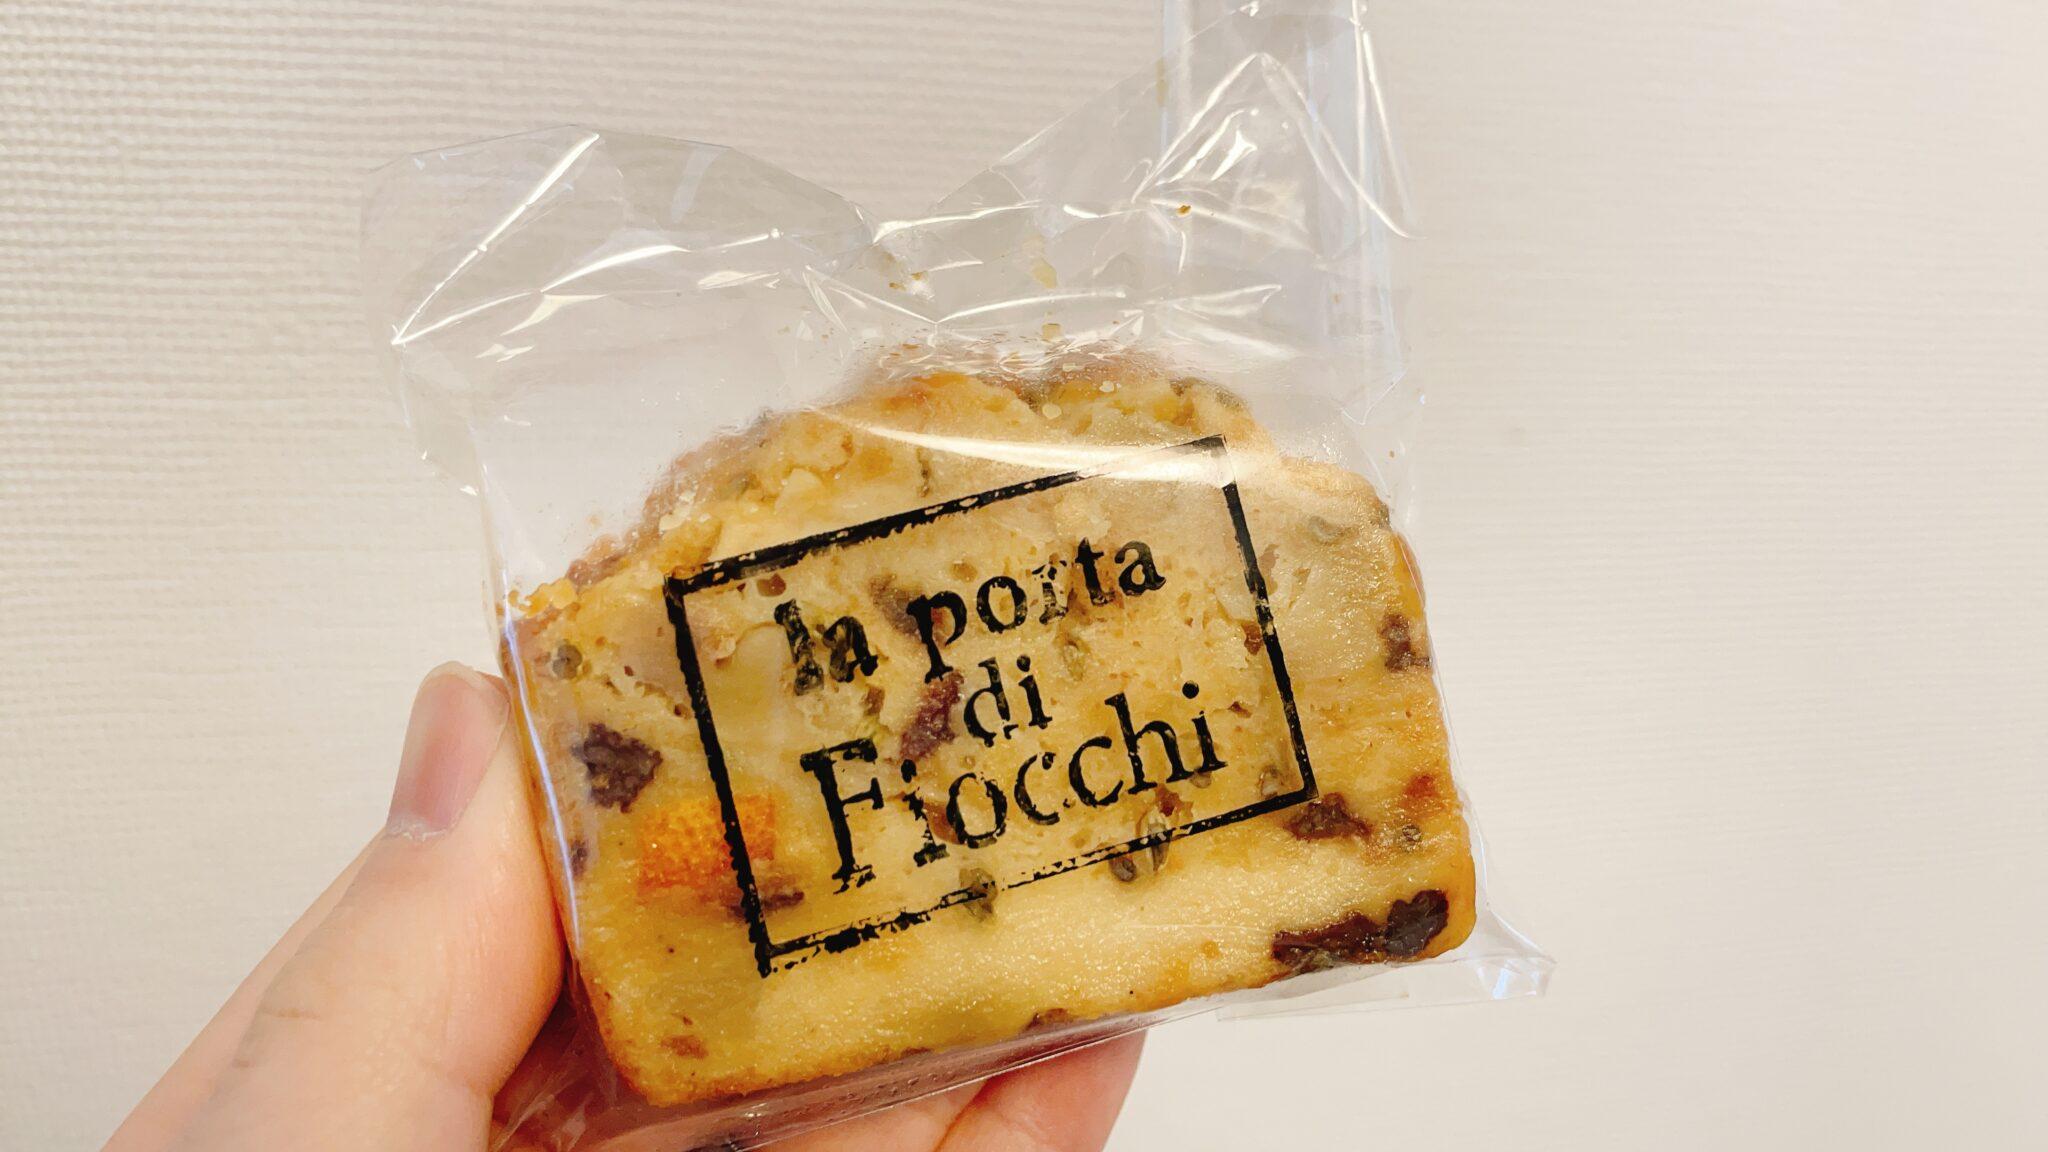 """La pota di Fiocchi(ラ・ポルタ・ディ・フィオッキ)""祖師ヶ谷大蔵のケーキ"